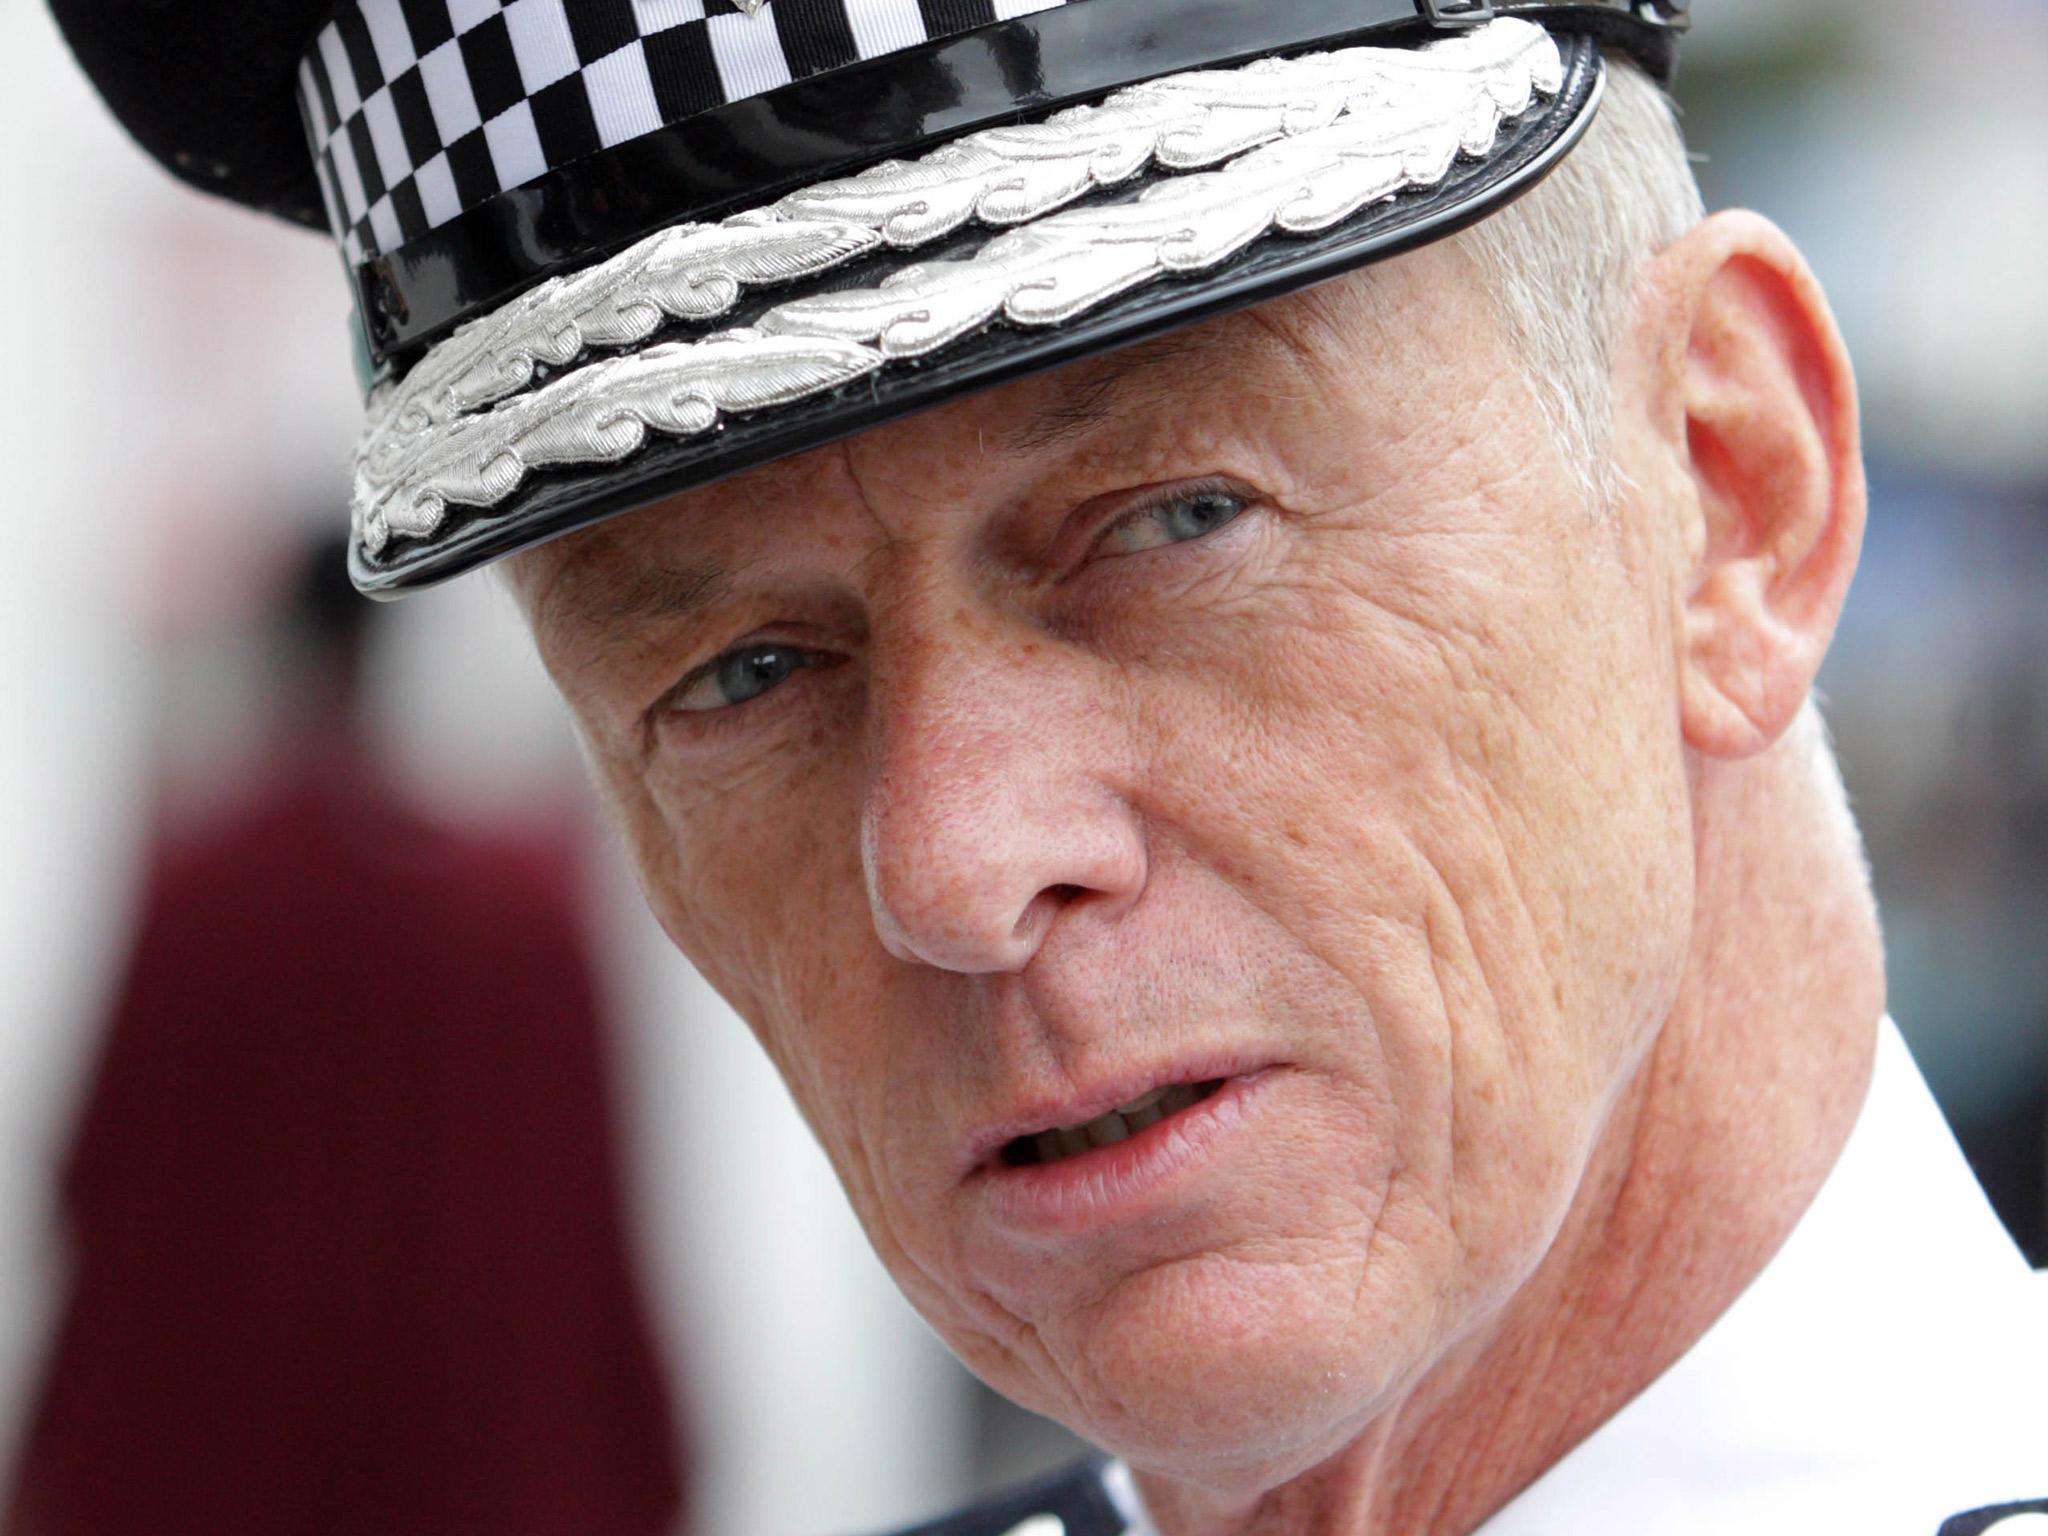 UK government must look into legalising cannabis, says former Met Commissioner Bernard Hogan-Howe